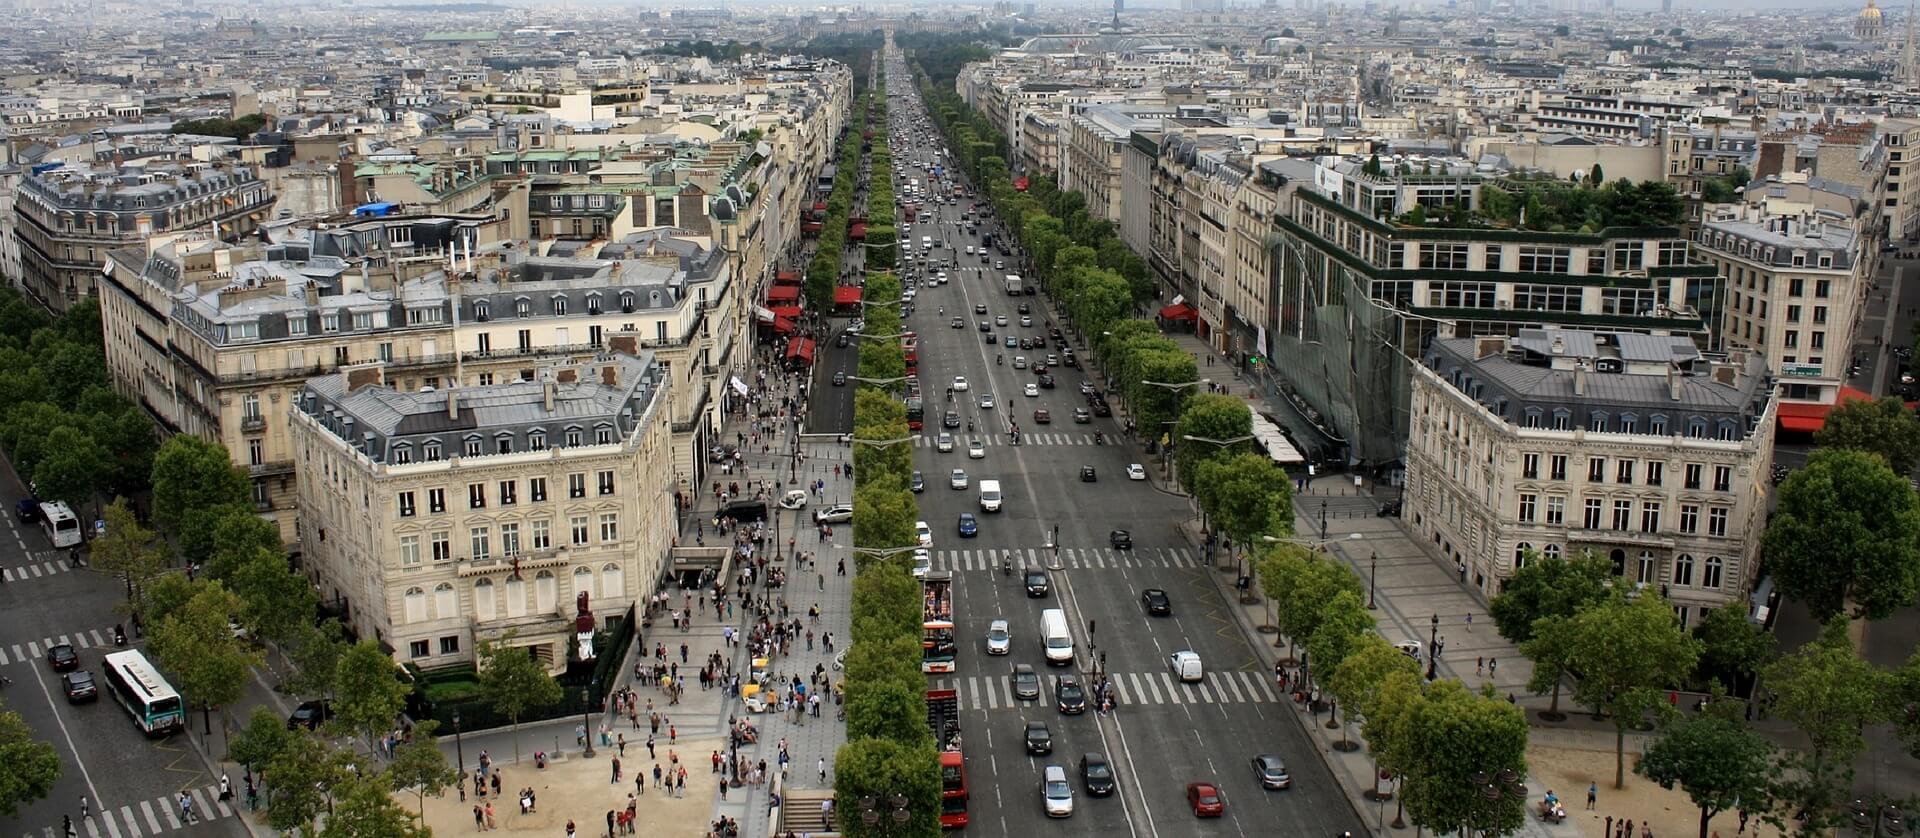 Passeios Paris, vista aérea da Avenida Champs-Élysées